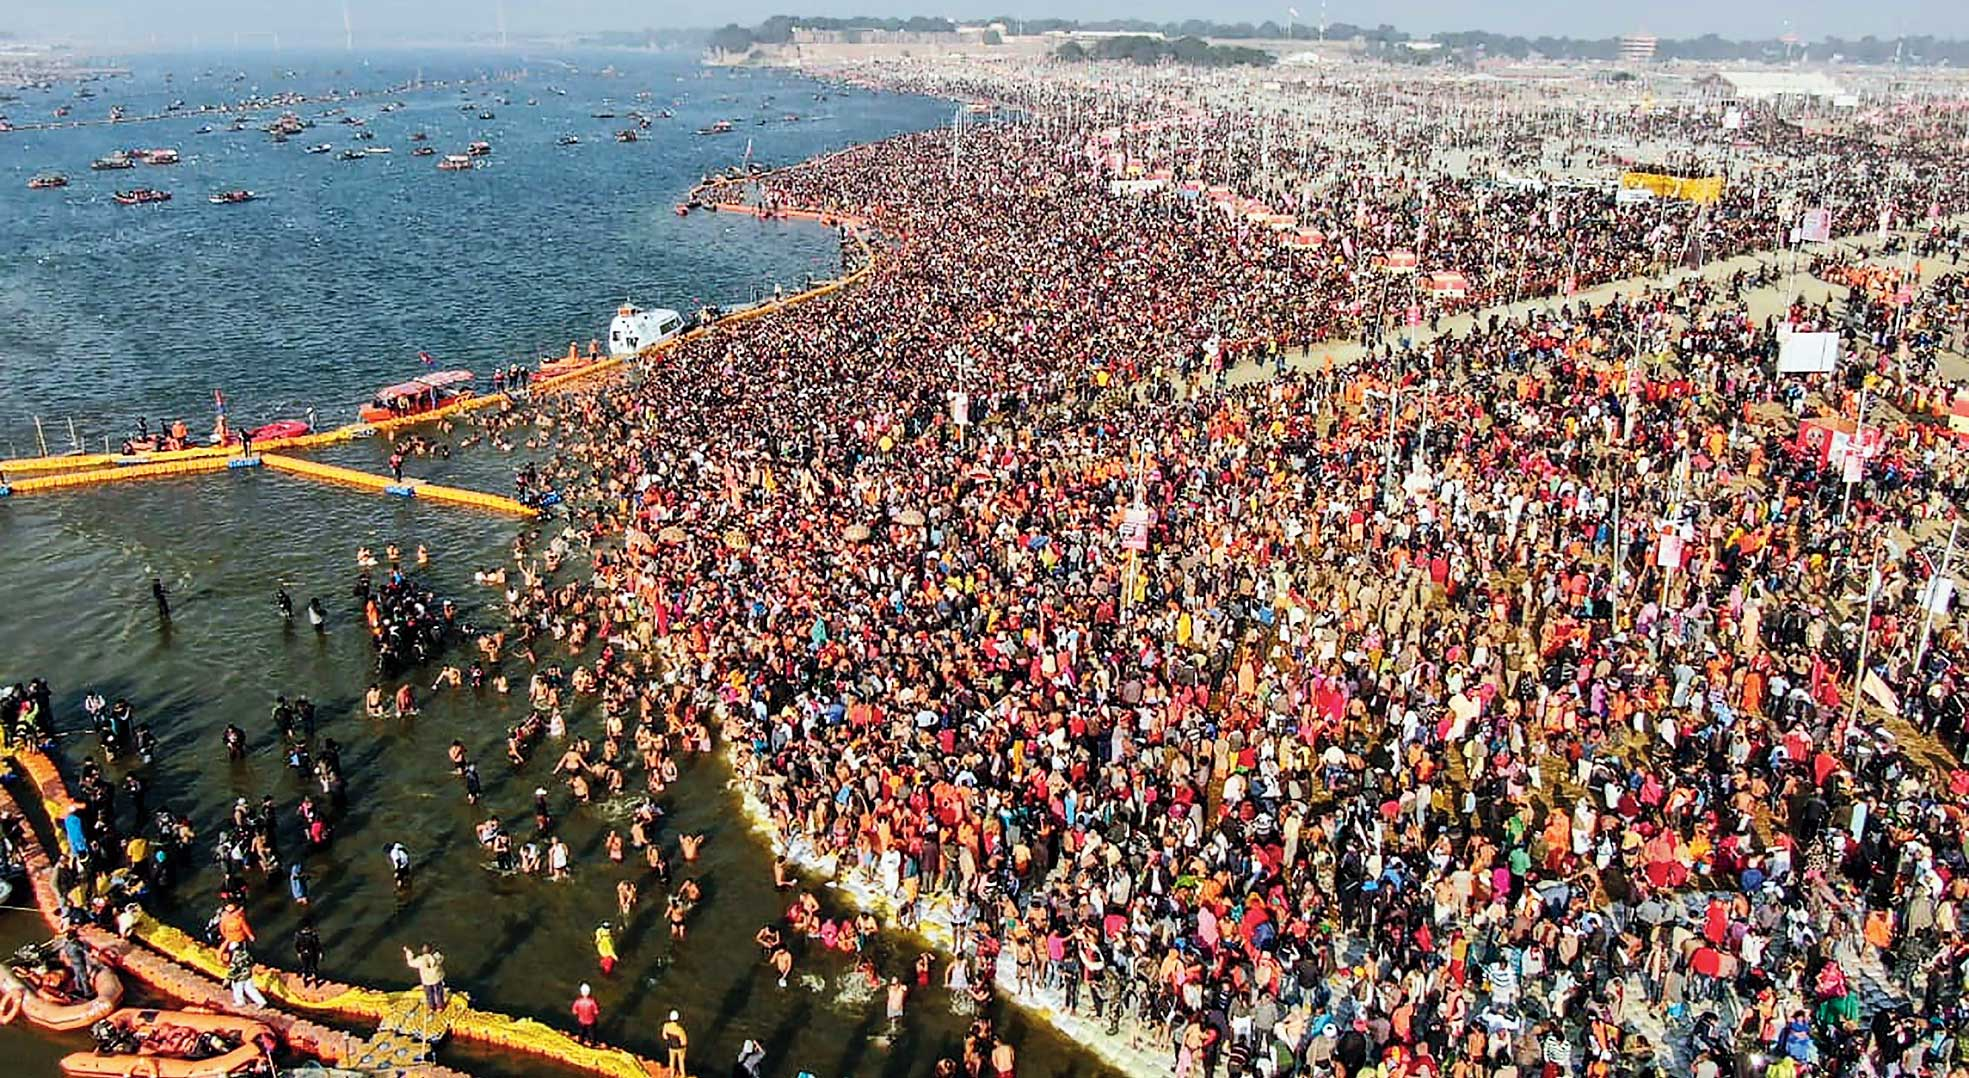 A sea of devotees at Kumbh Mela in Allahabad earlier this week